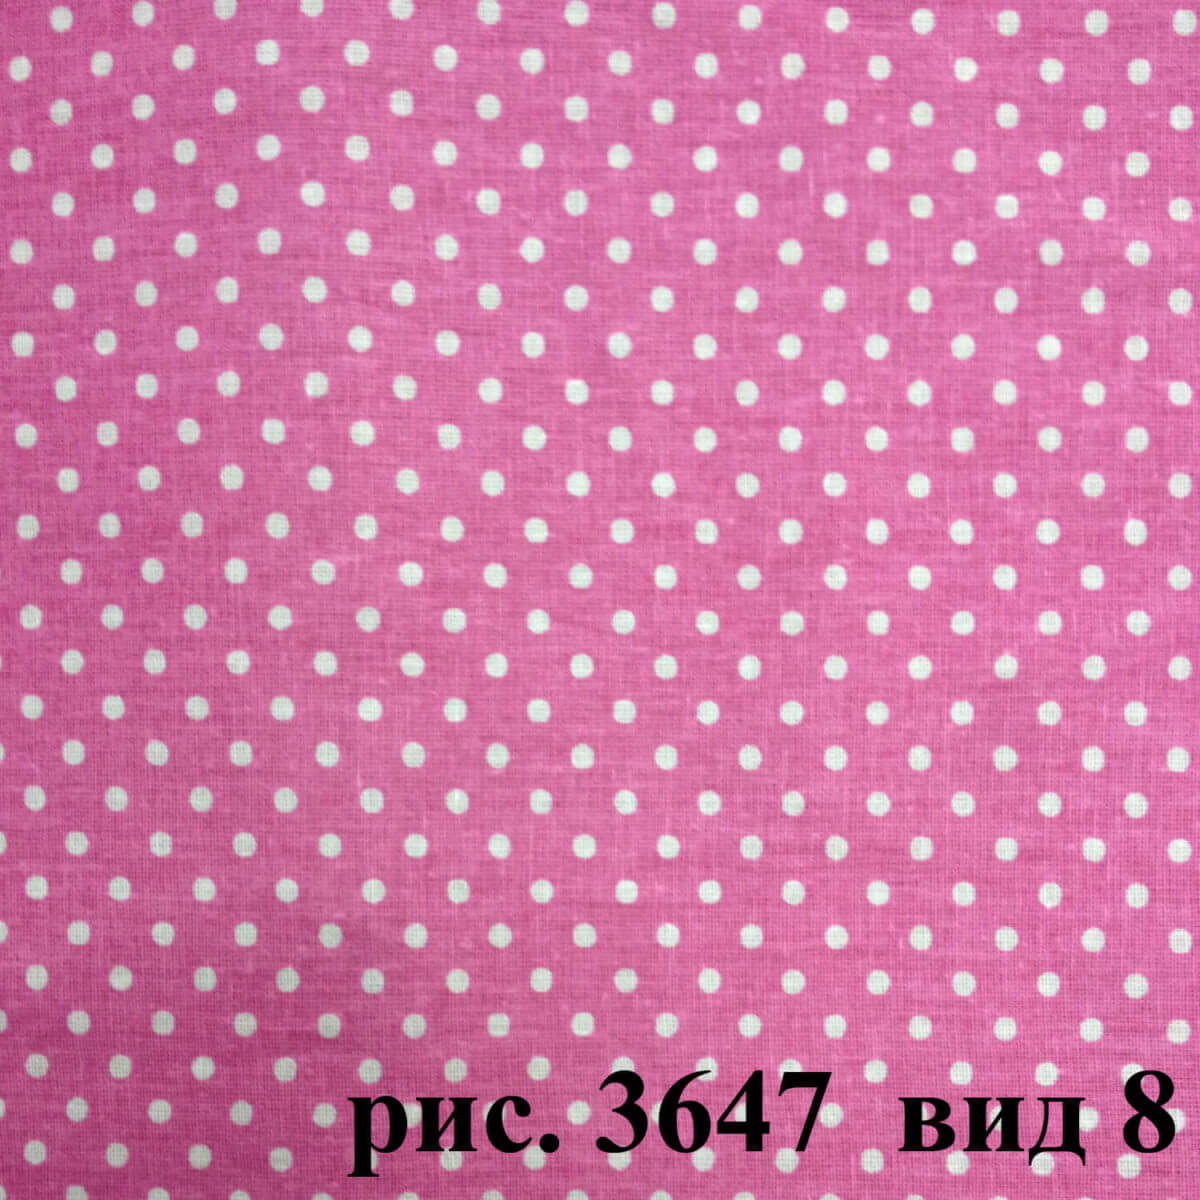 Фото 25 - Плательная ткань бязь 150 см (3647/9) Под заказ.